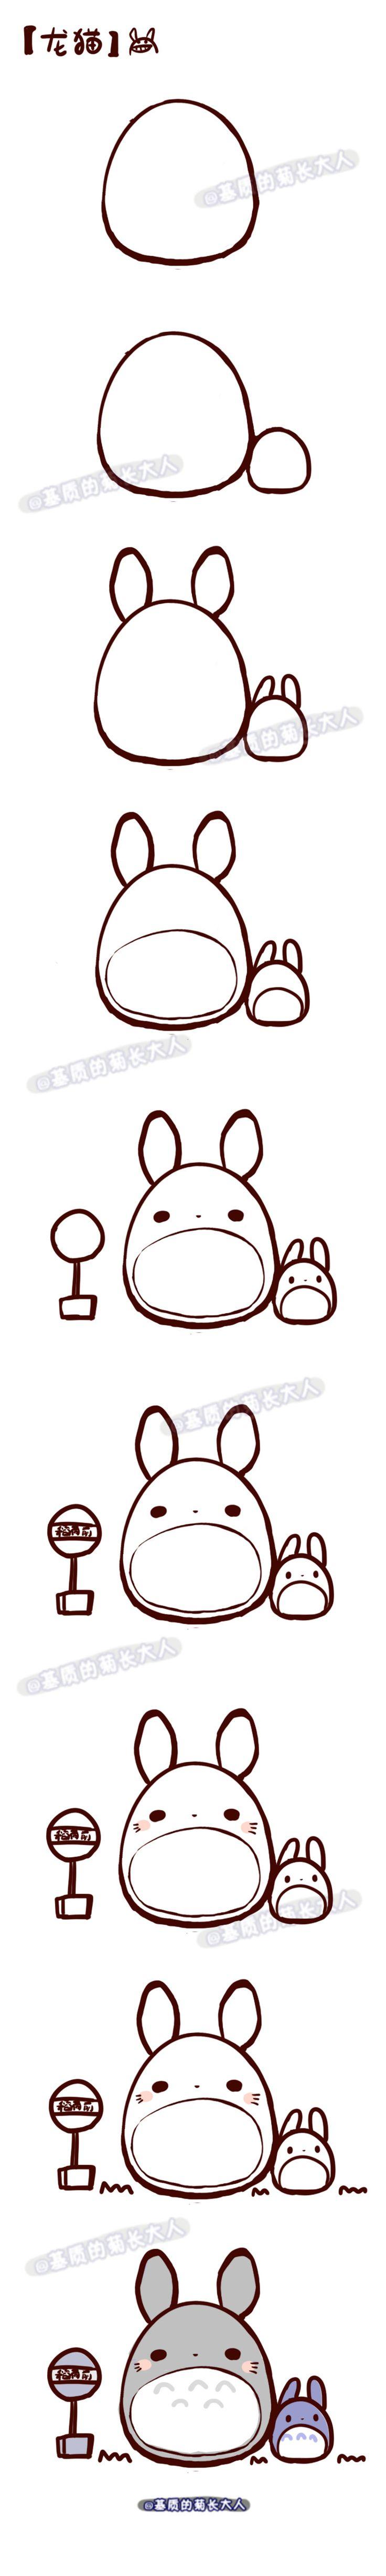 Totoro ~ @salsabillaghina